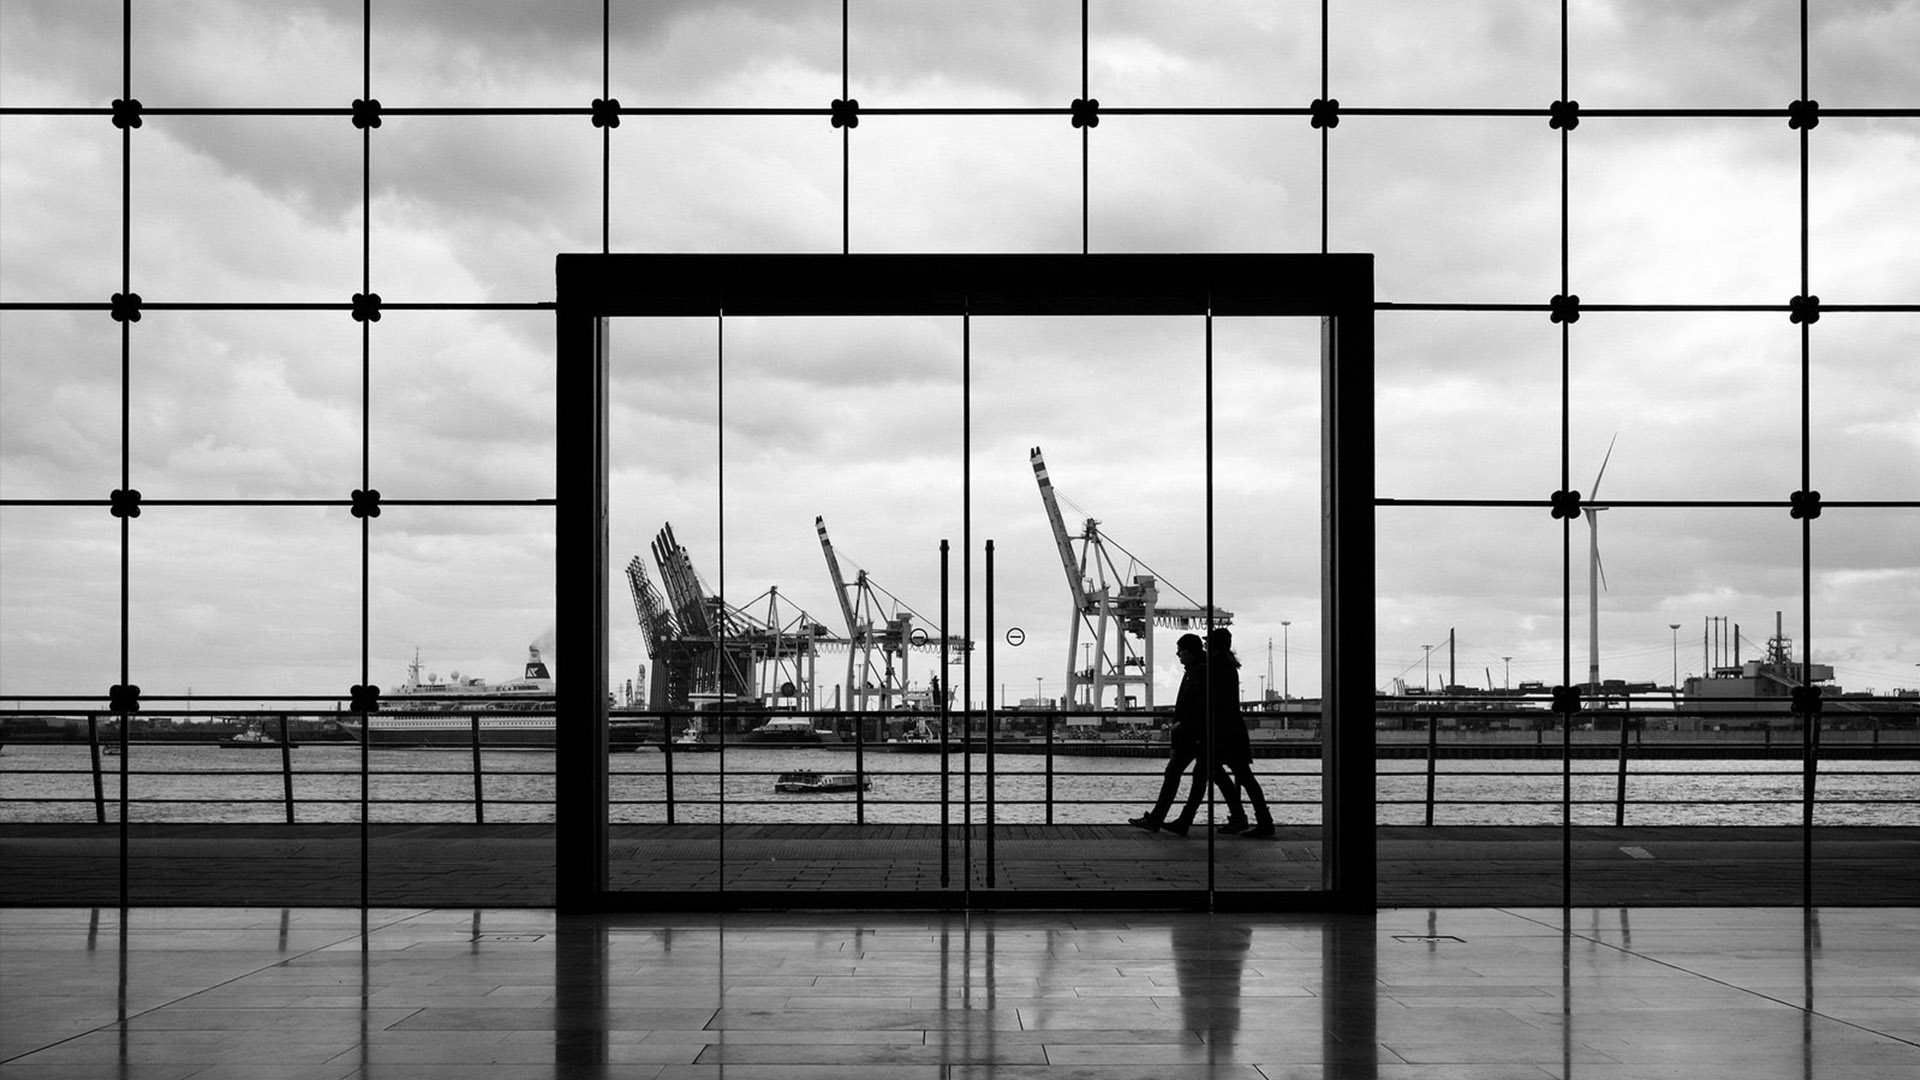 Photofocus Photographer of the Day Jens with Hafen, Hamburg, Germany. Travel